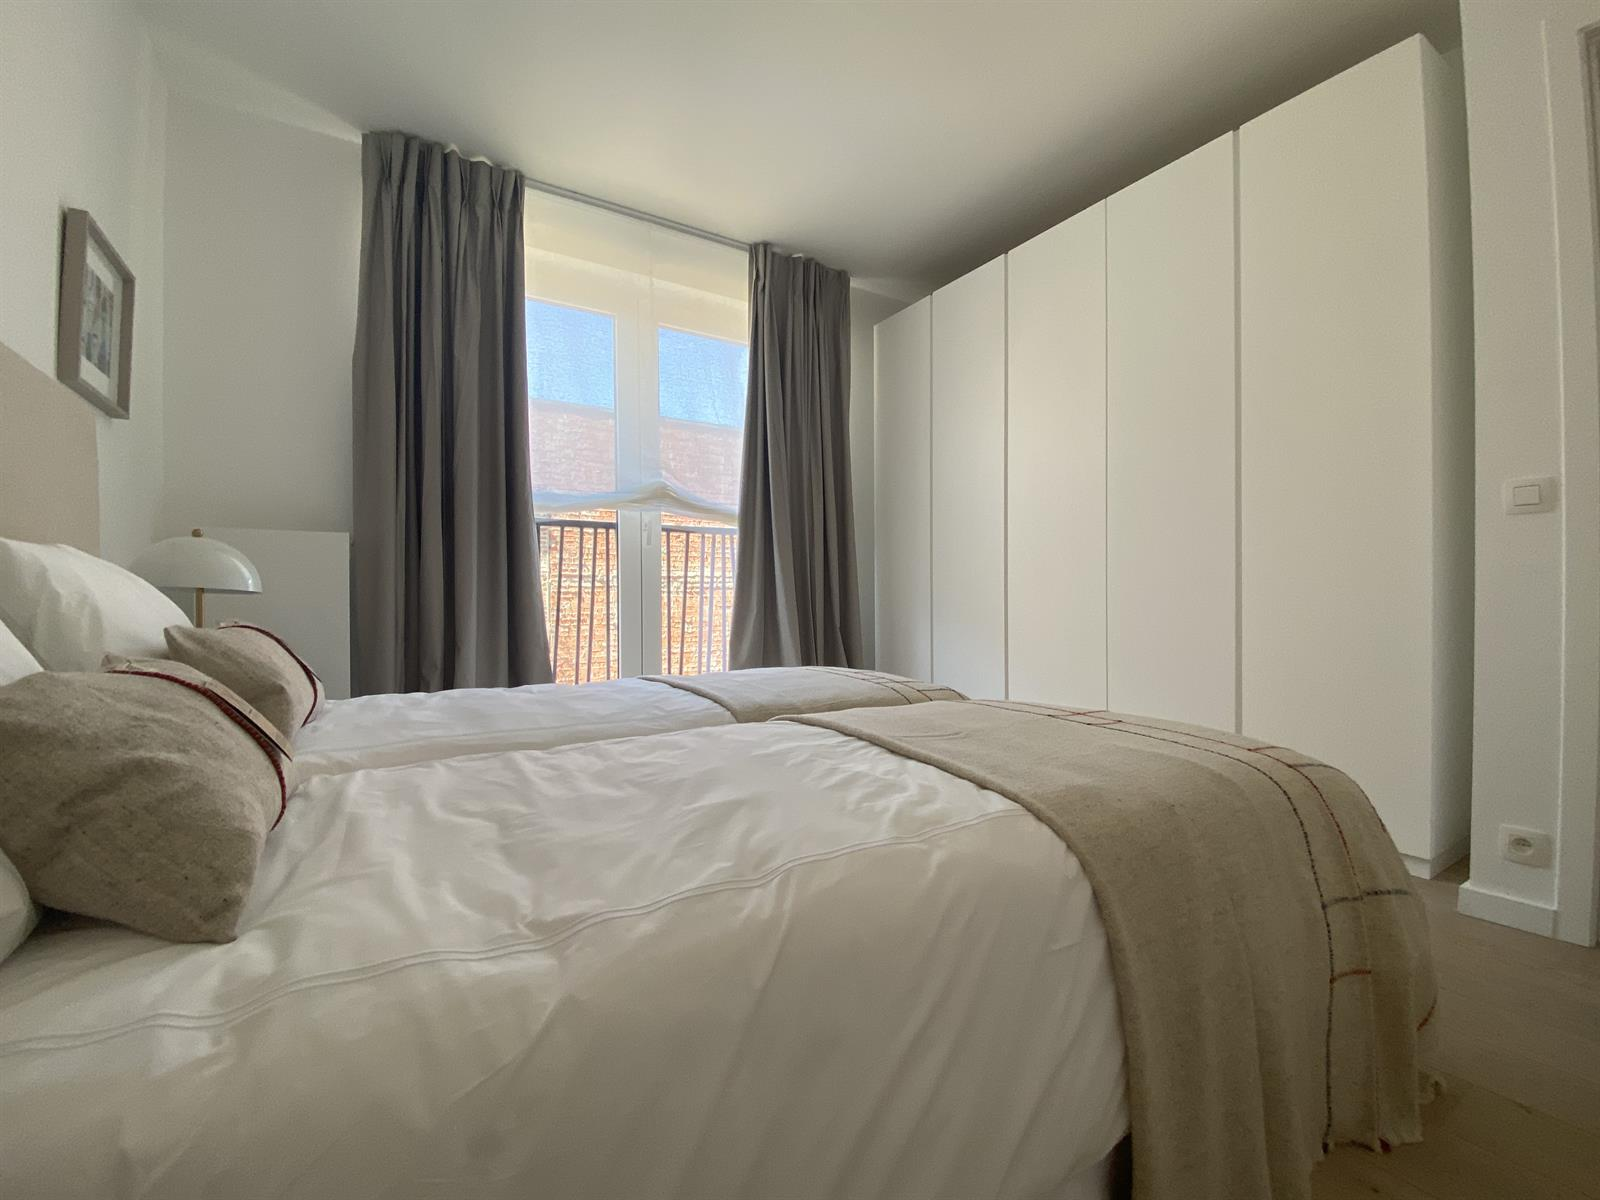 Appartement - Woluwe-Saint-Lambert - #4455478-6